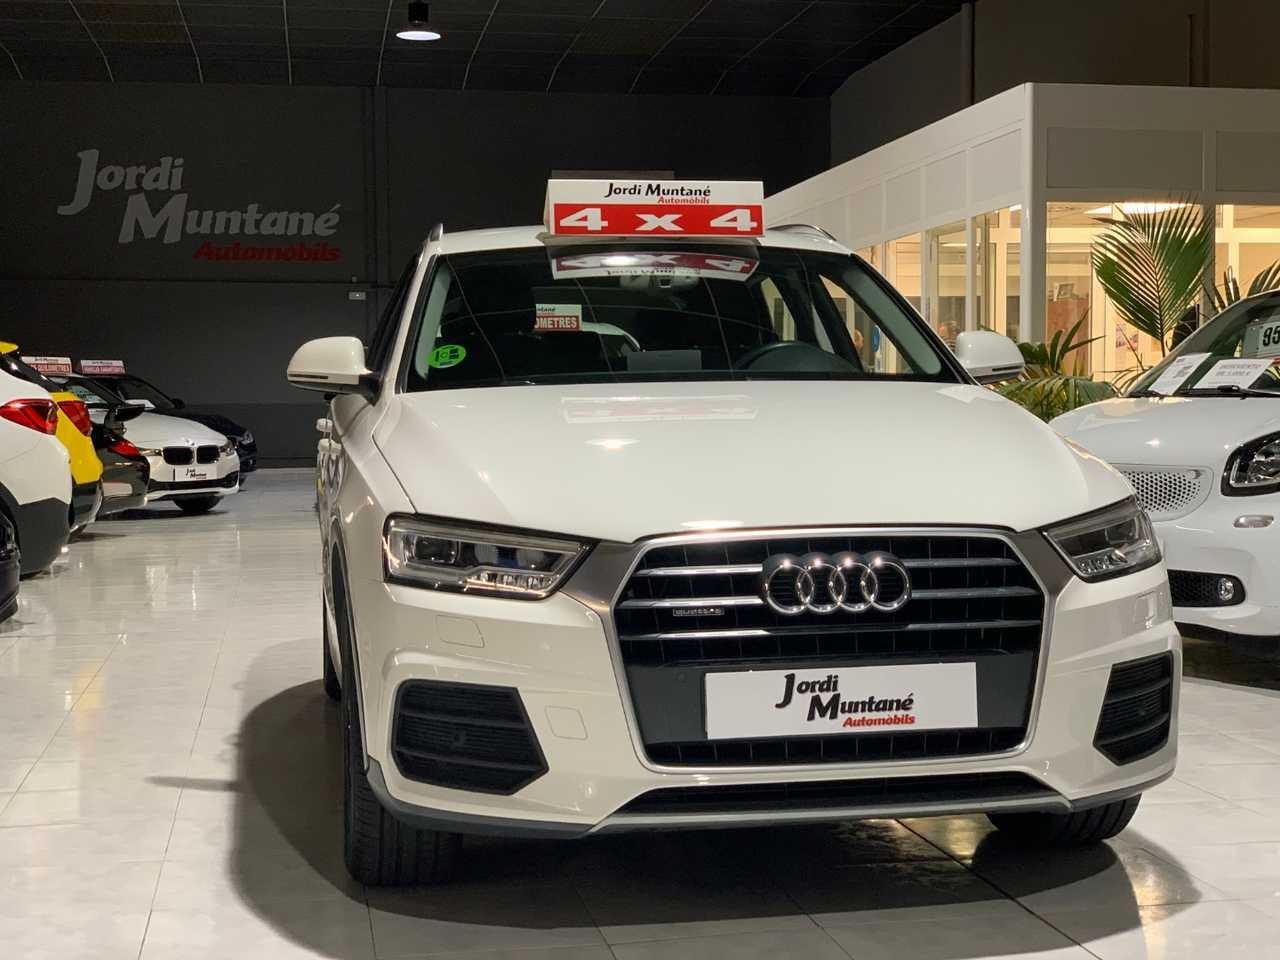 Audi Q3 2.0 TDI 150cv -. '' QUATTRO '' .- Automático S-Tronic -.